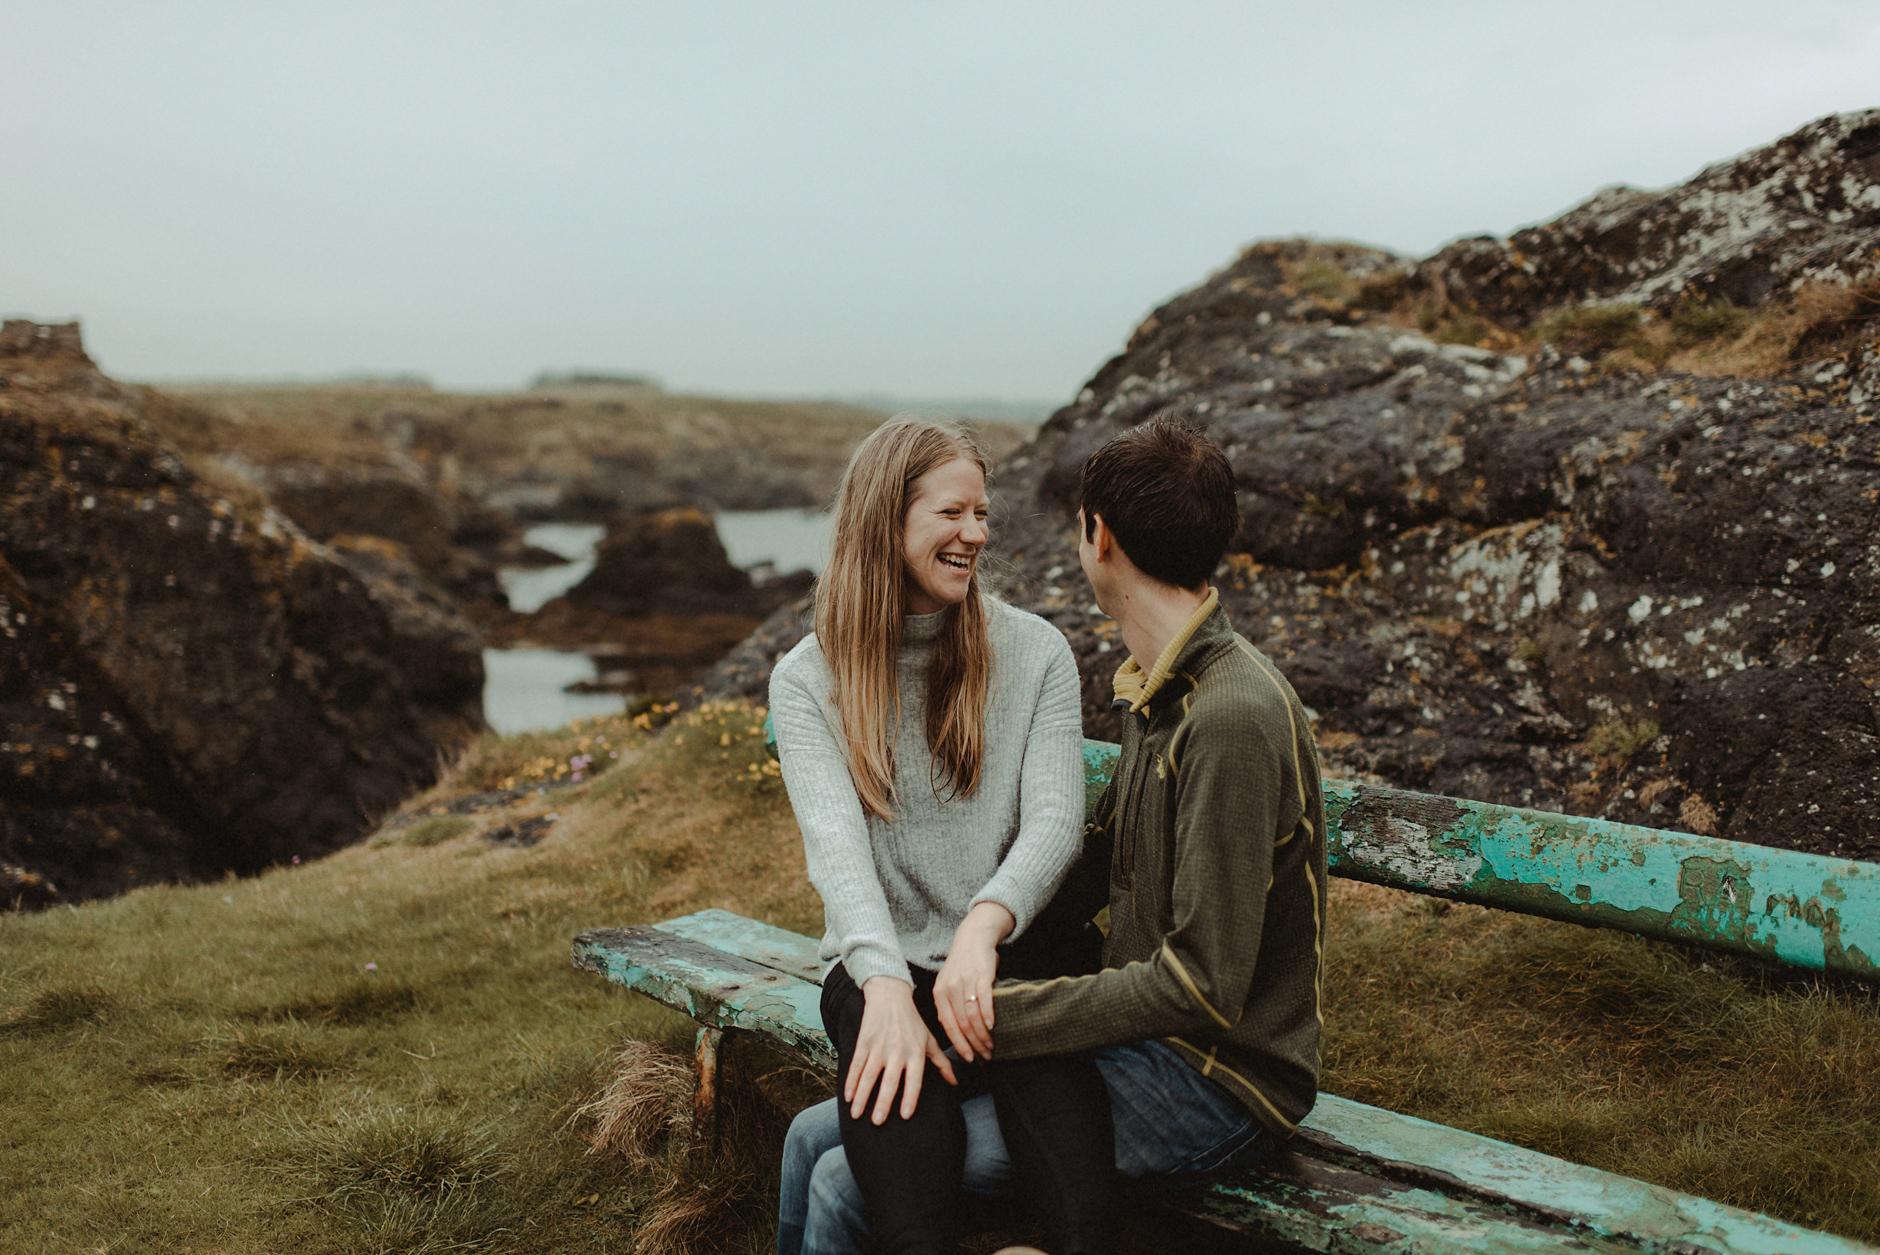 Elie_Wedding_Photographer_Alternative_Nikki_Leadbetter_Photography-154.jpg